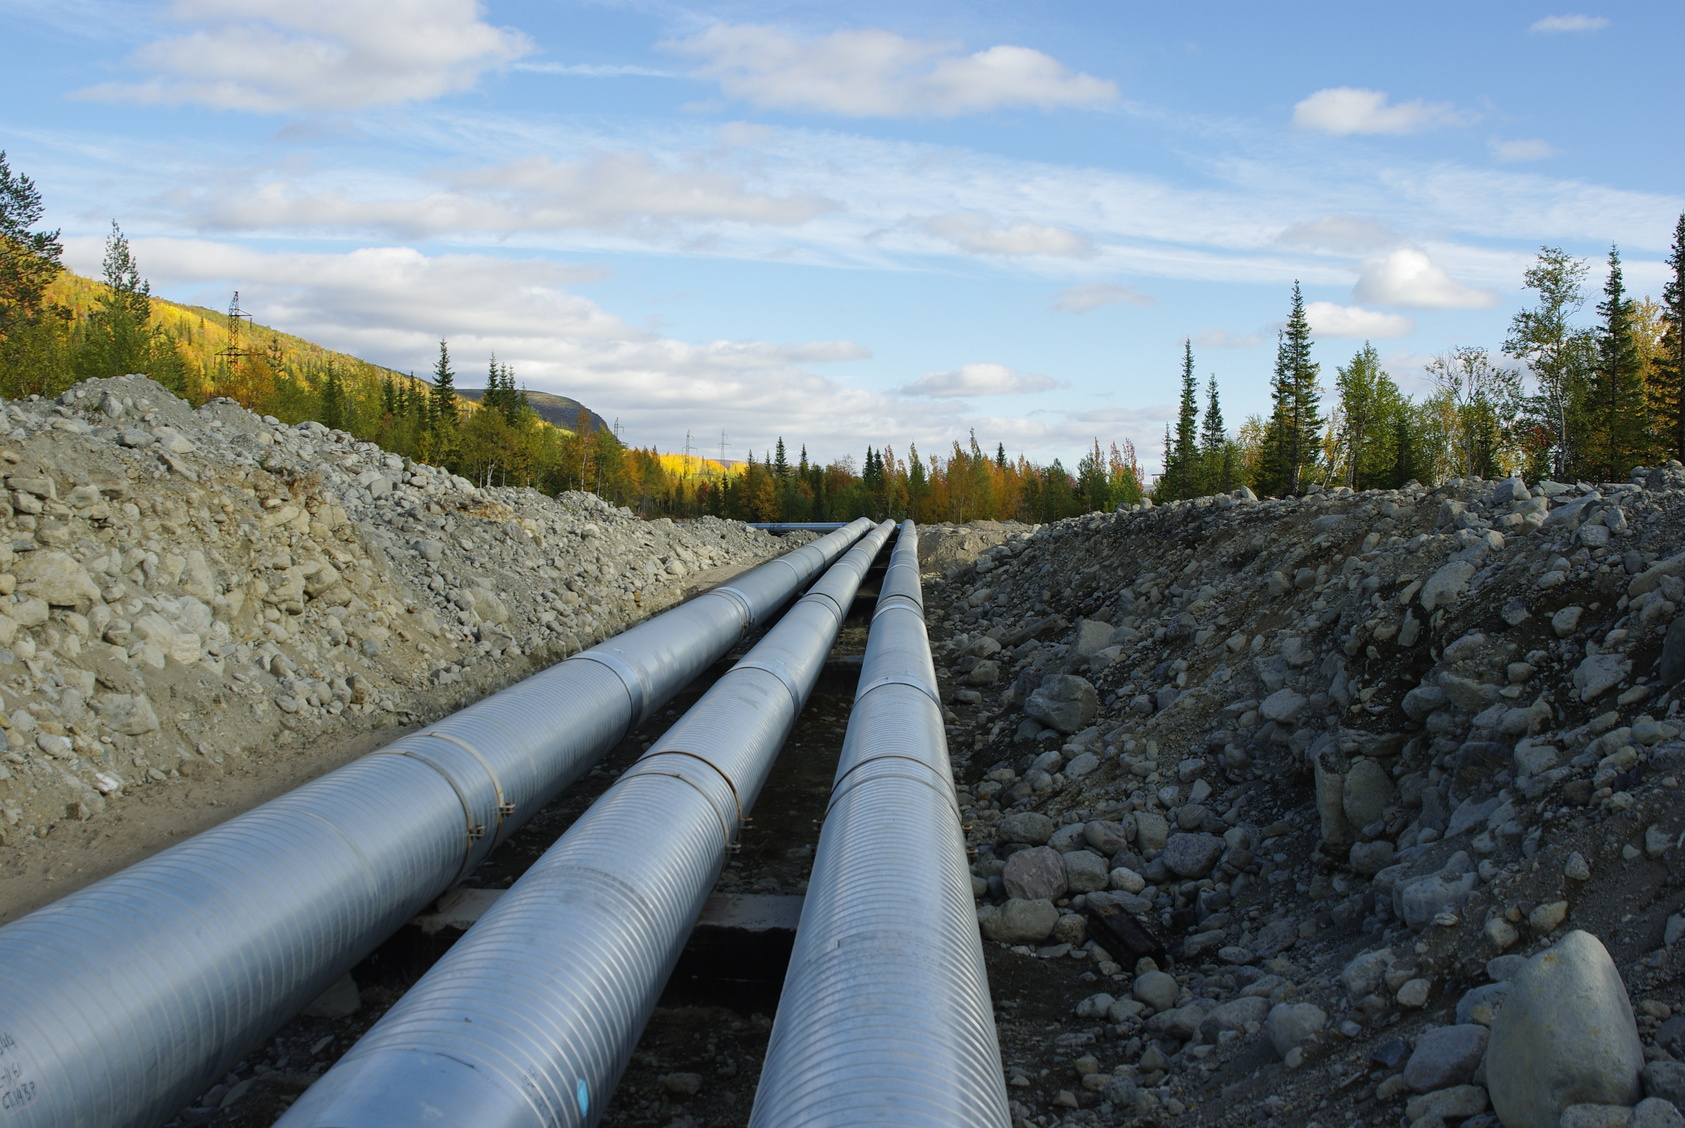 Fotolia_71186476_Pipelines_M